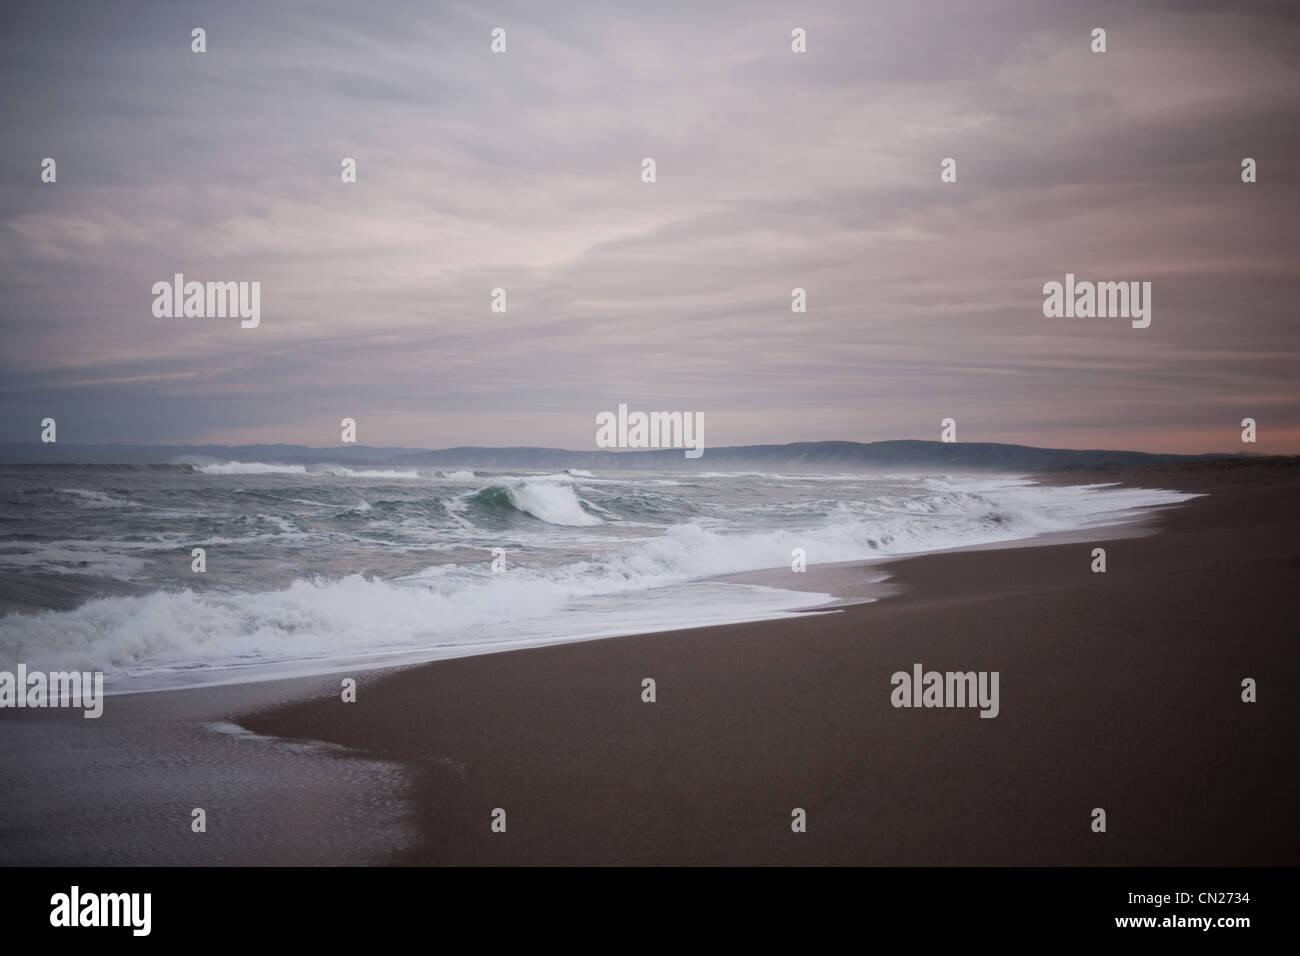 Californian coastline, USA - Stock Image